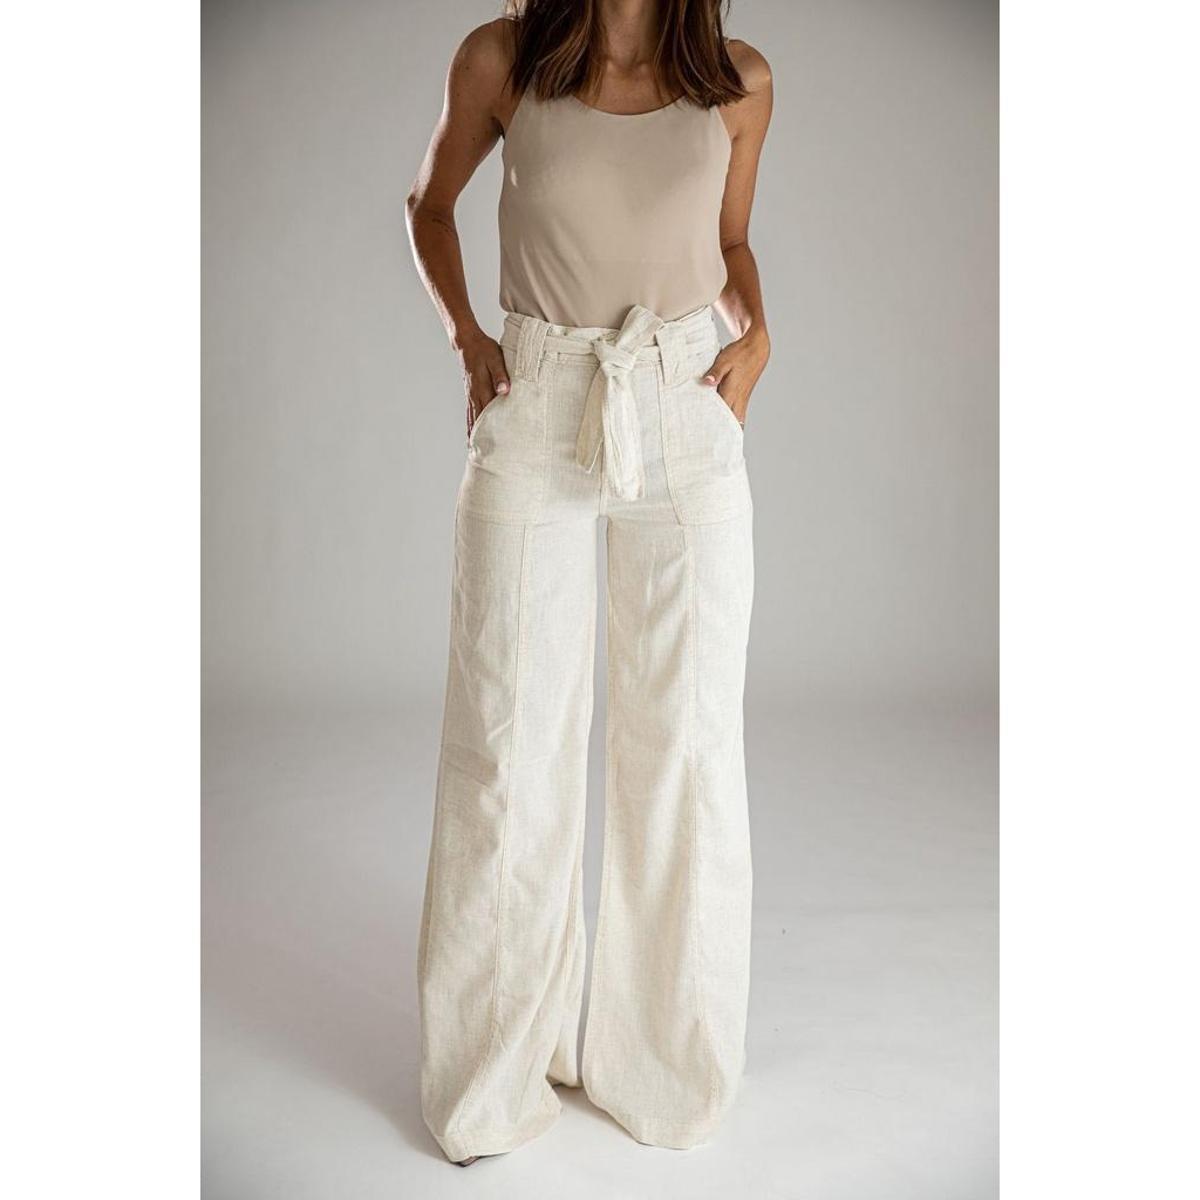 Calça Pantalona Wide Leg Linho Mikonos Santé Denim Feminina